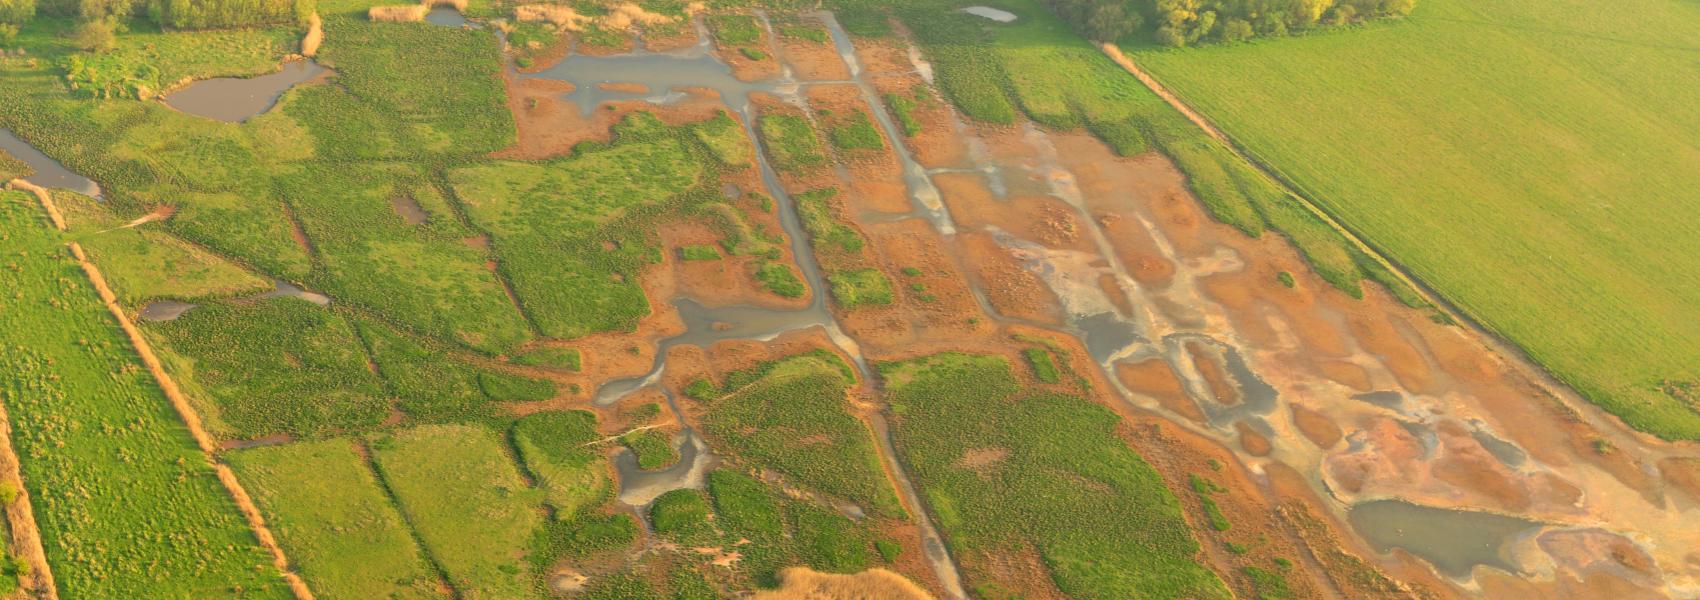 luchtfoto van putten weiden